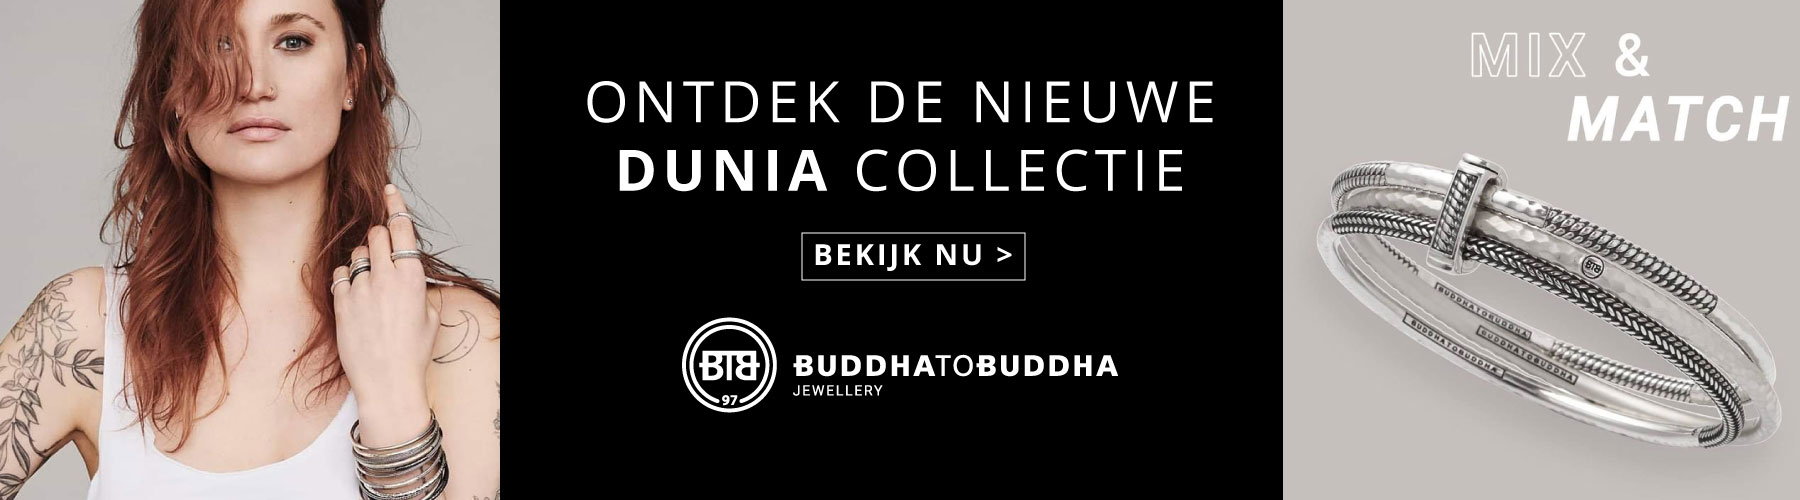 ONTDEK-de-nieuwe-dunia-collectie-Buddha-to-buddha-bij-Wolters-Juweliers